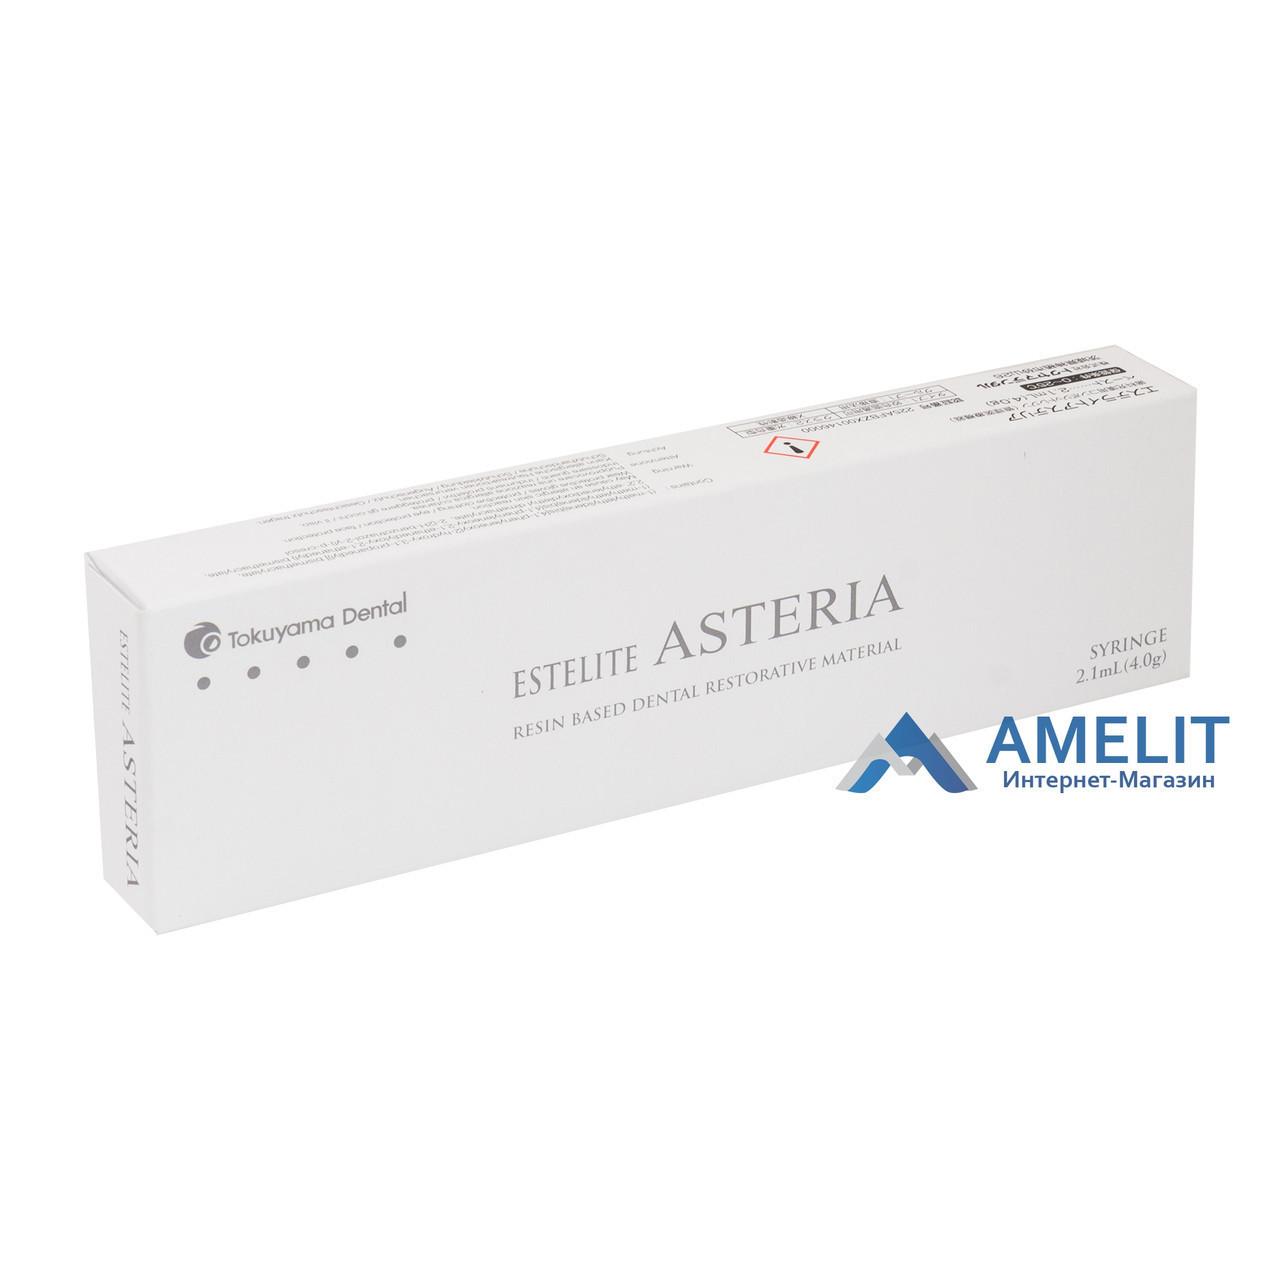 Эстелайт Астерия TE (Estelite Asteria, Tokuyama Dental), шприц 4г